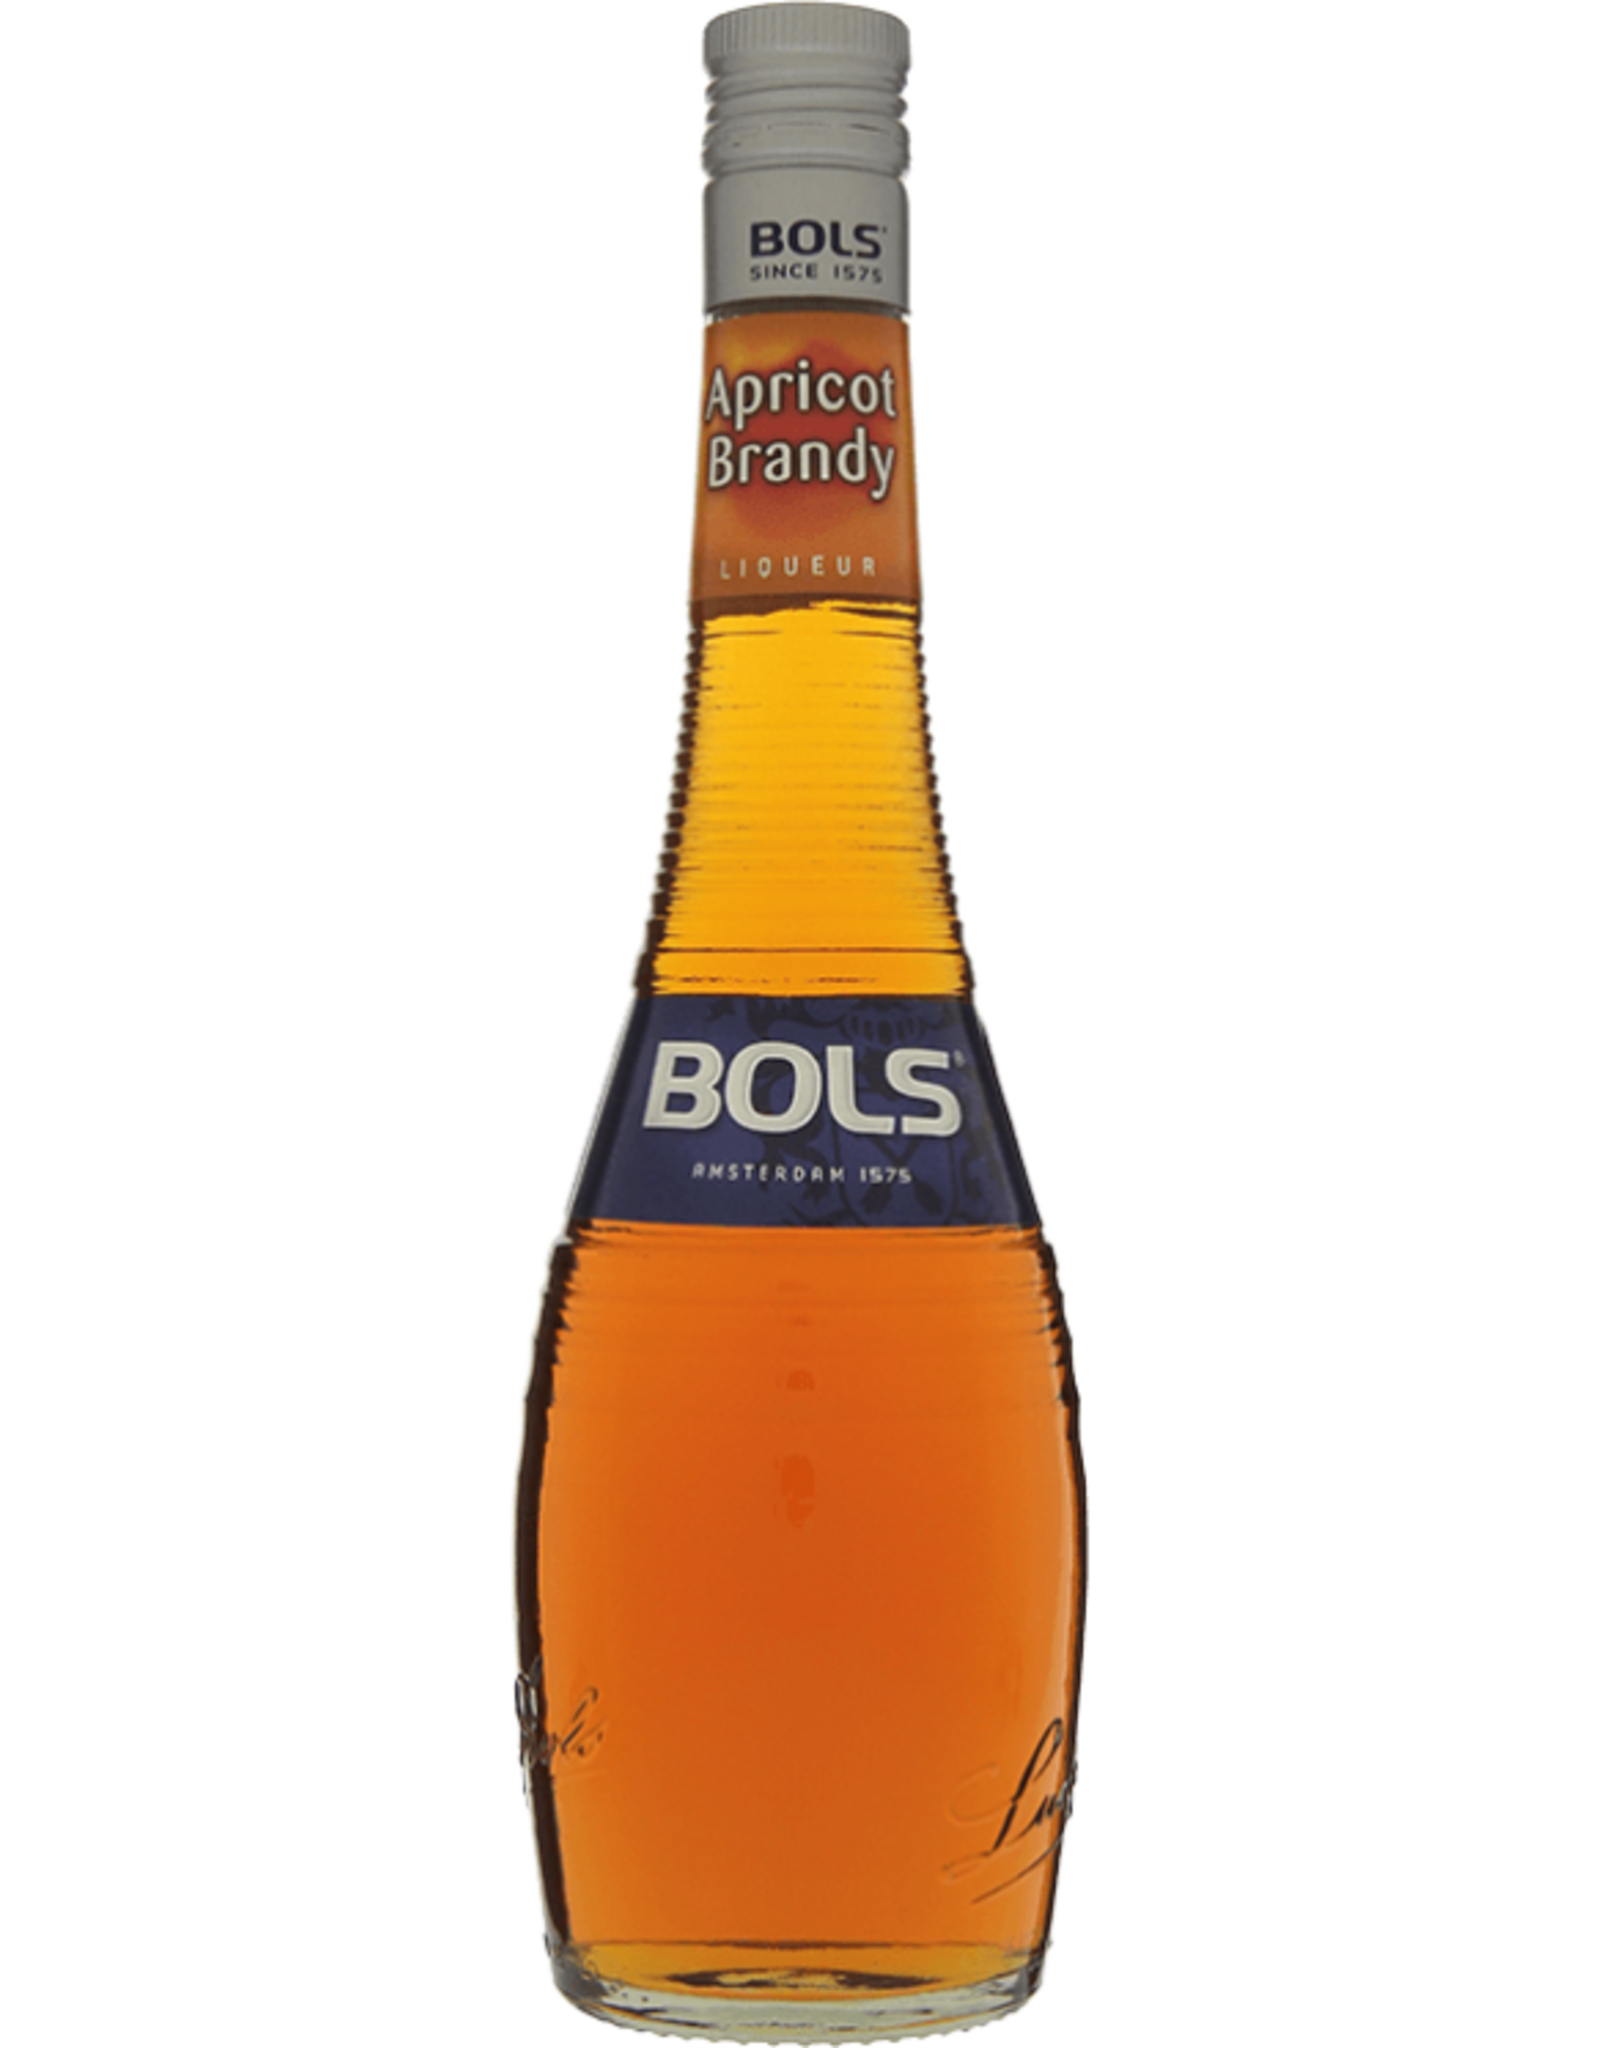 Bols Bols Apricot Brandy 70cl